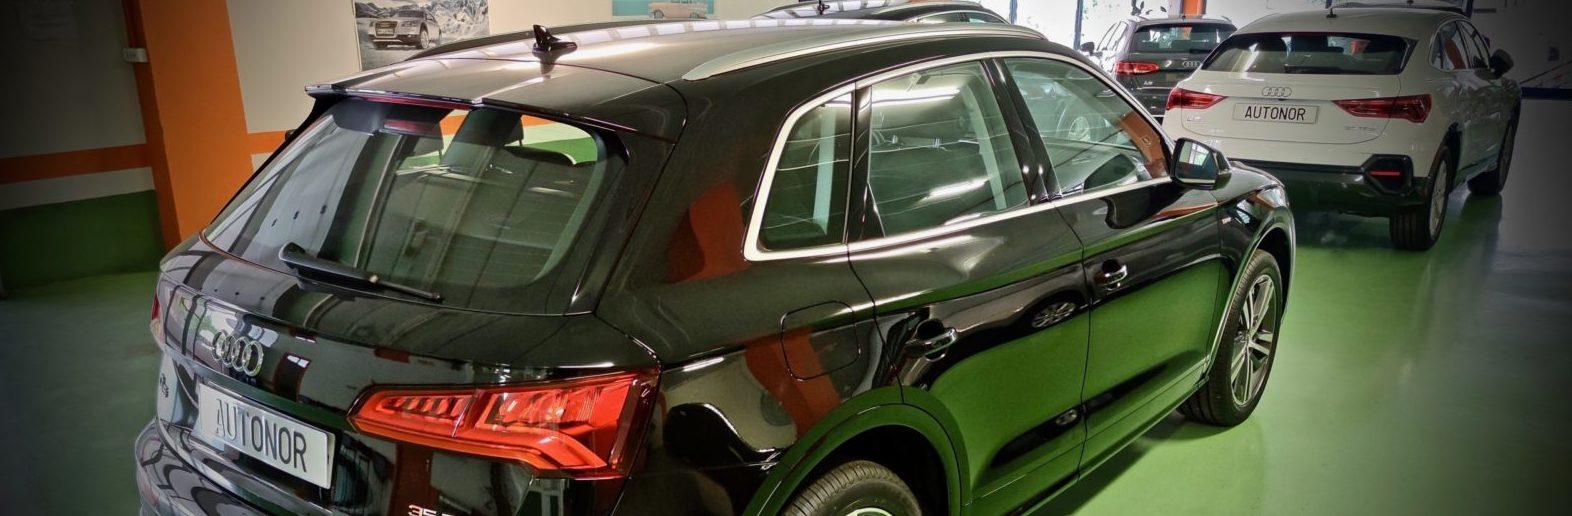 AUDI Q5 35 TDI S line quattro-ultra S tronic 120kW